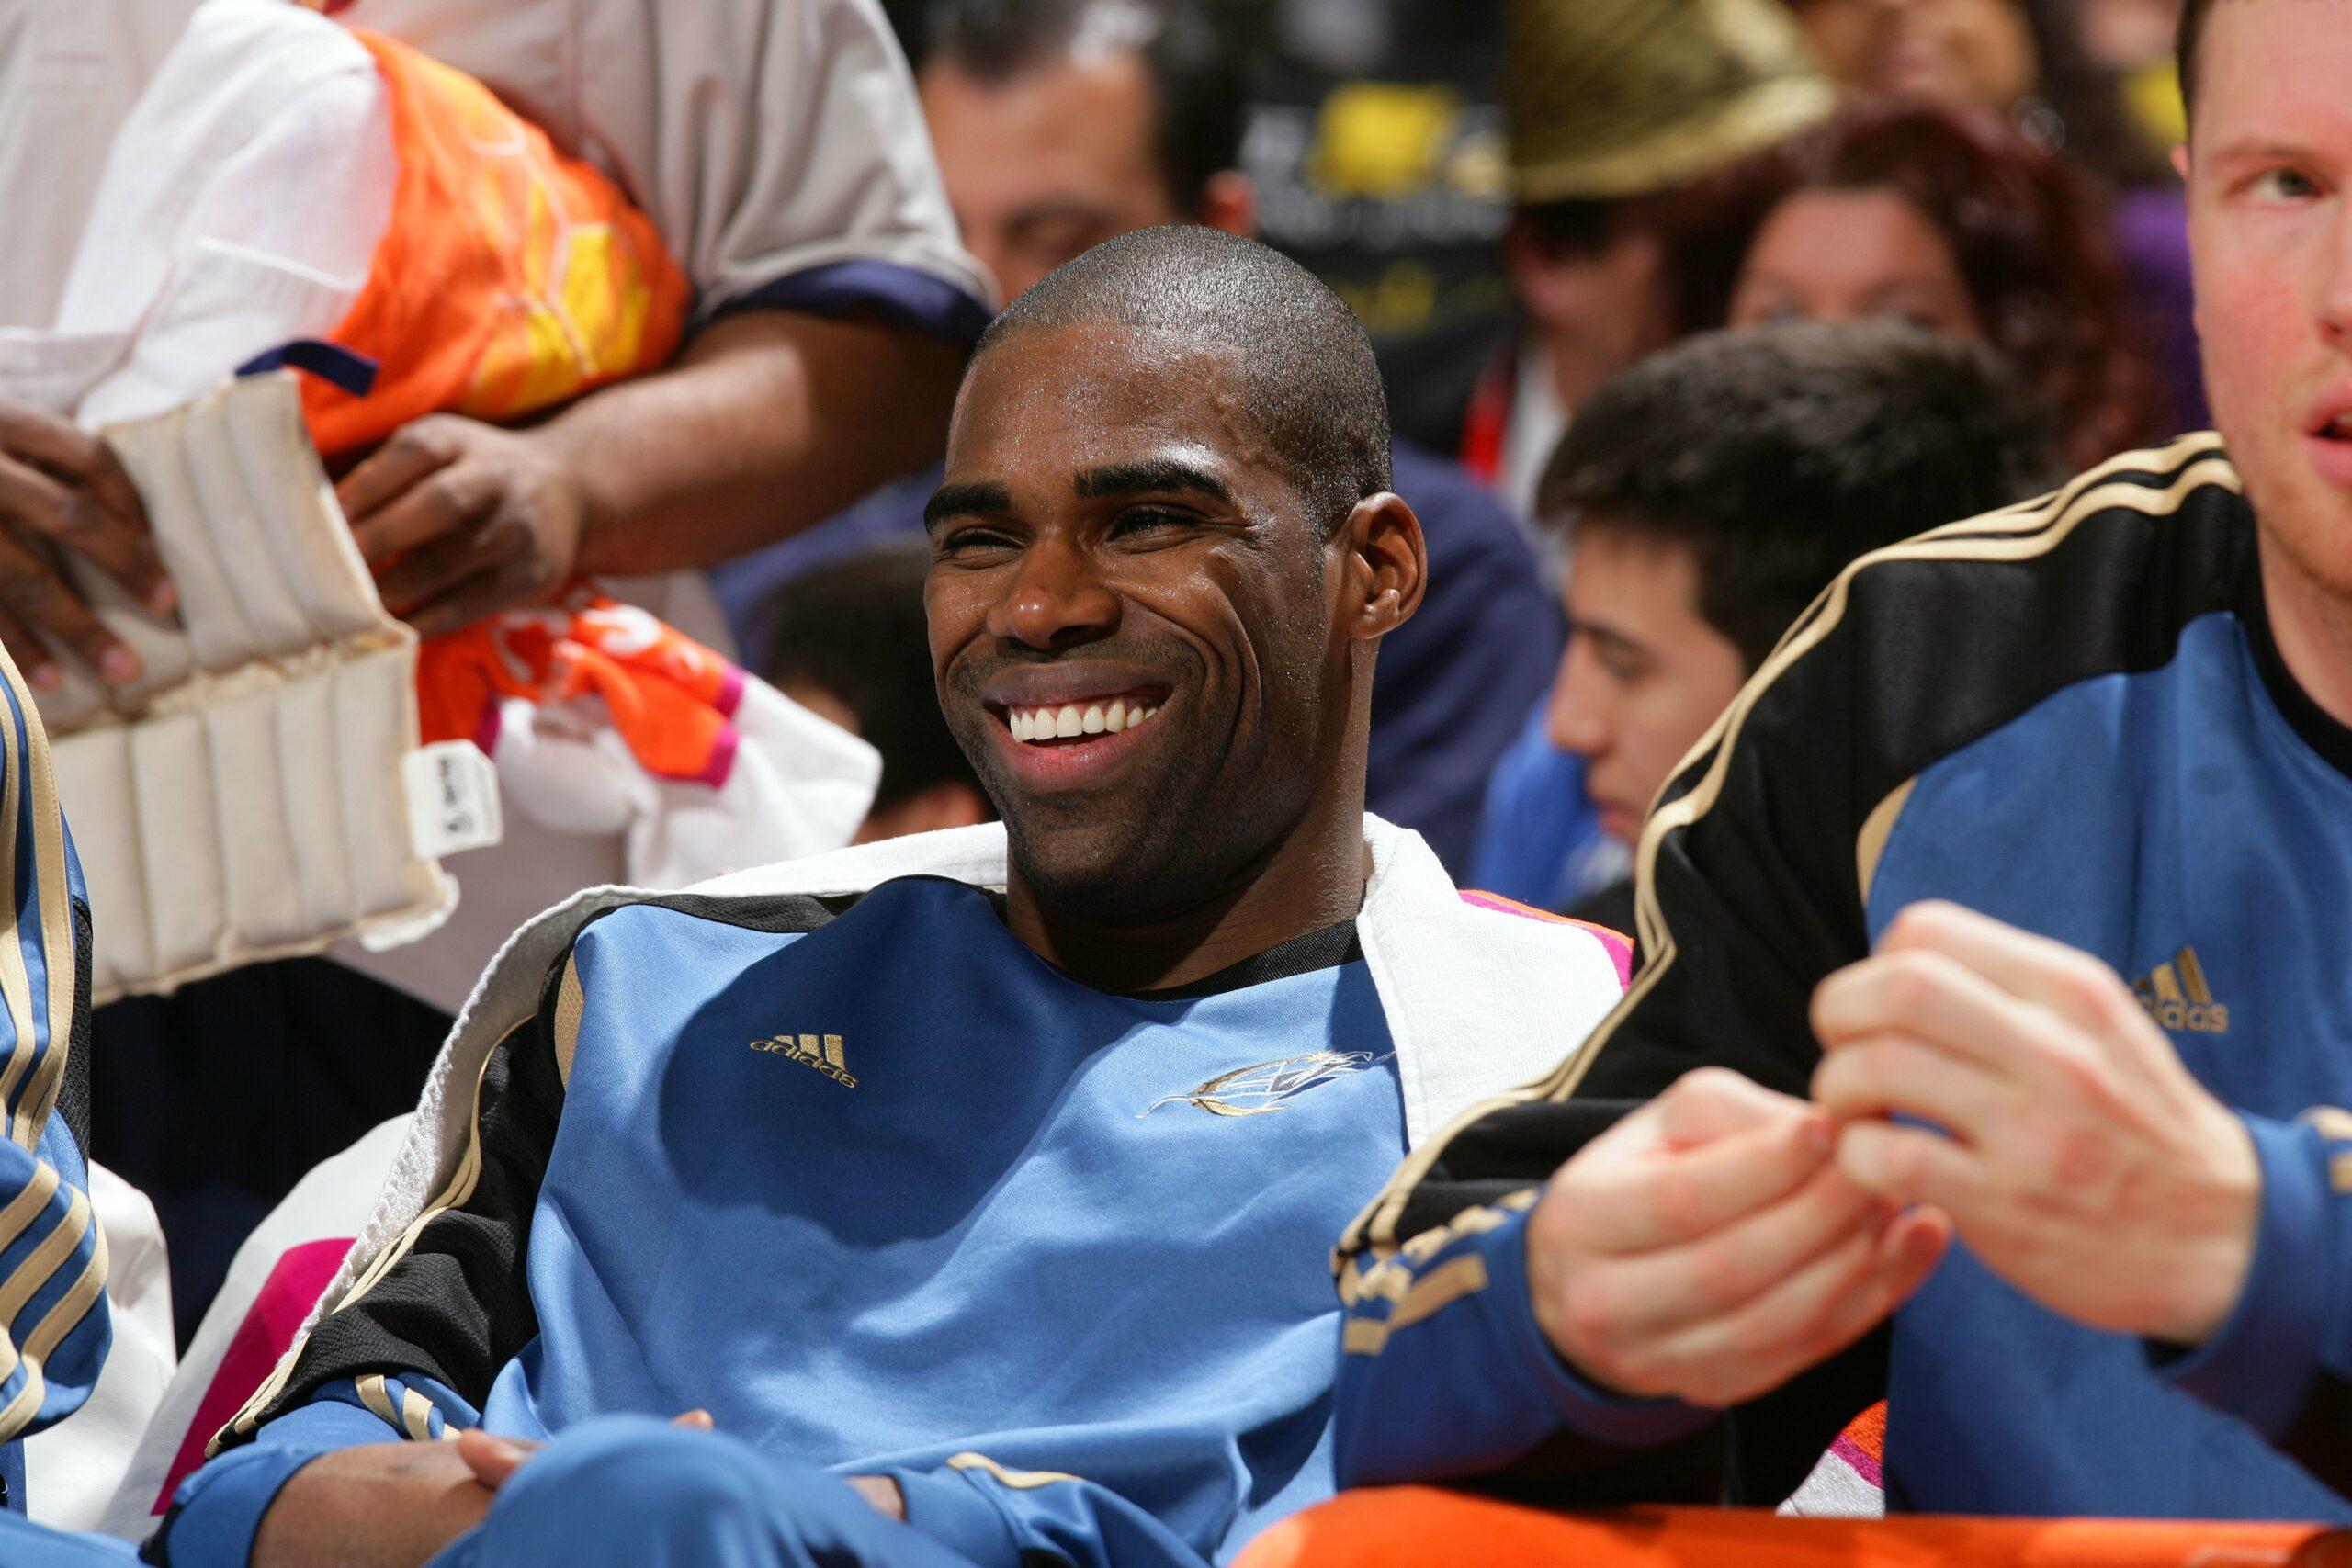 Pierce, Jamison among 6 NBA draftees headed to college hoops Hall